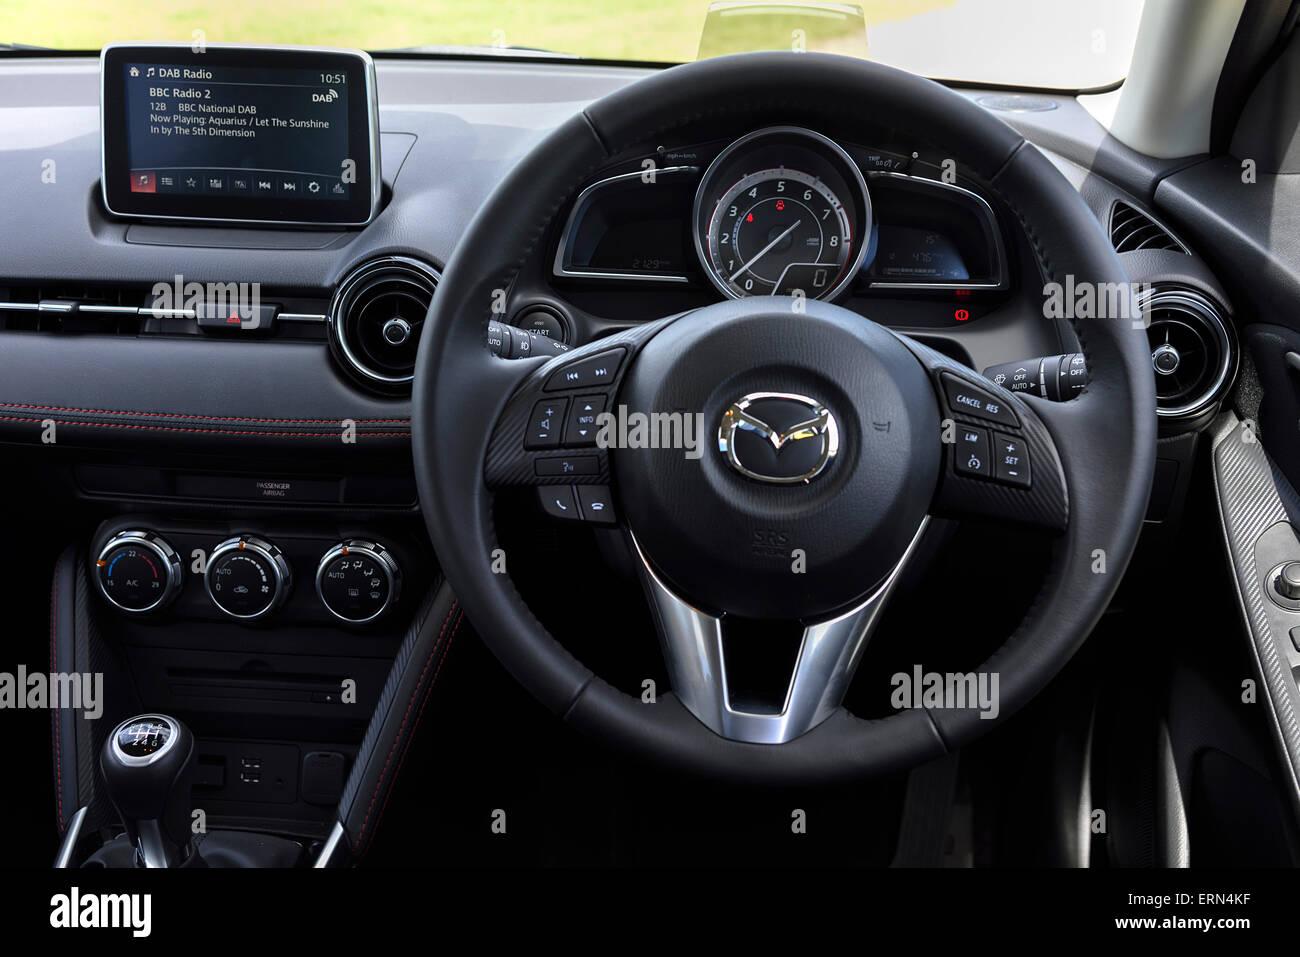 Kelebihan Kekurangan Mazda 2 2015 Review